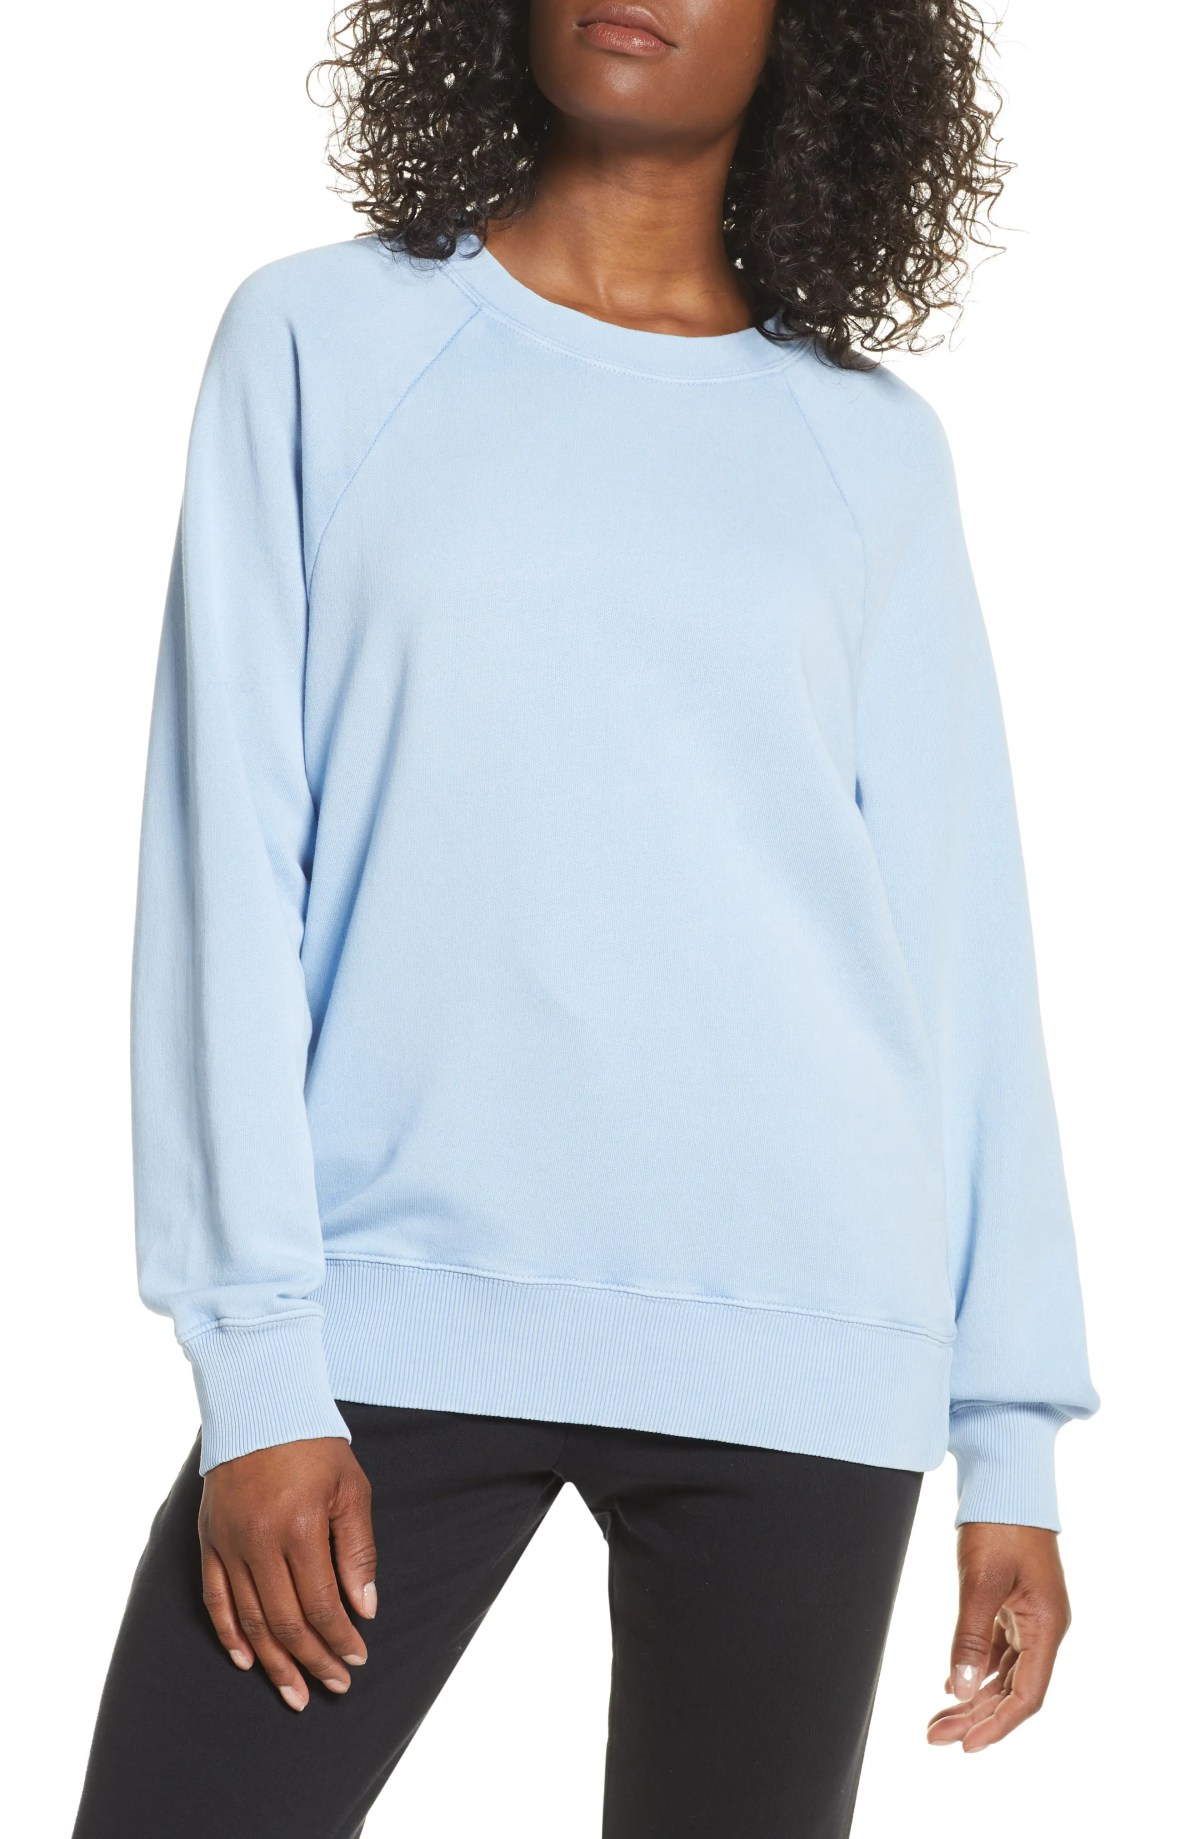 ZELLA Jamie Crewneck Sweatshirt, Main, color, BLUE CASHMERE